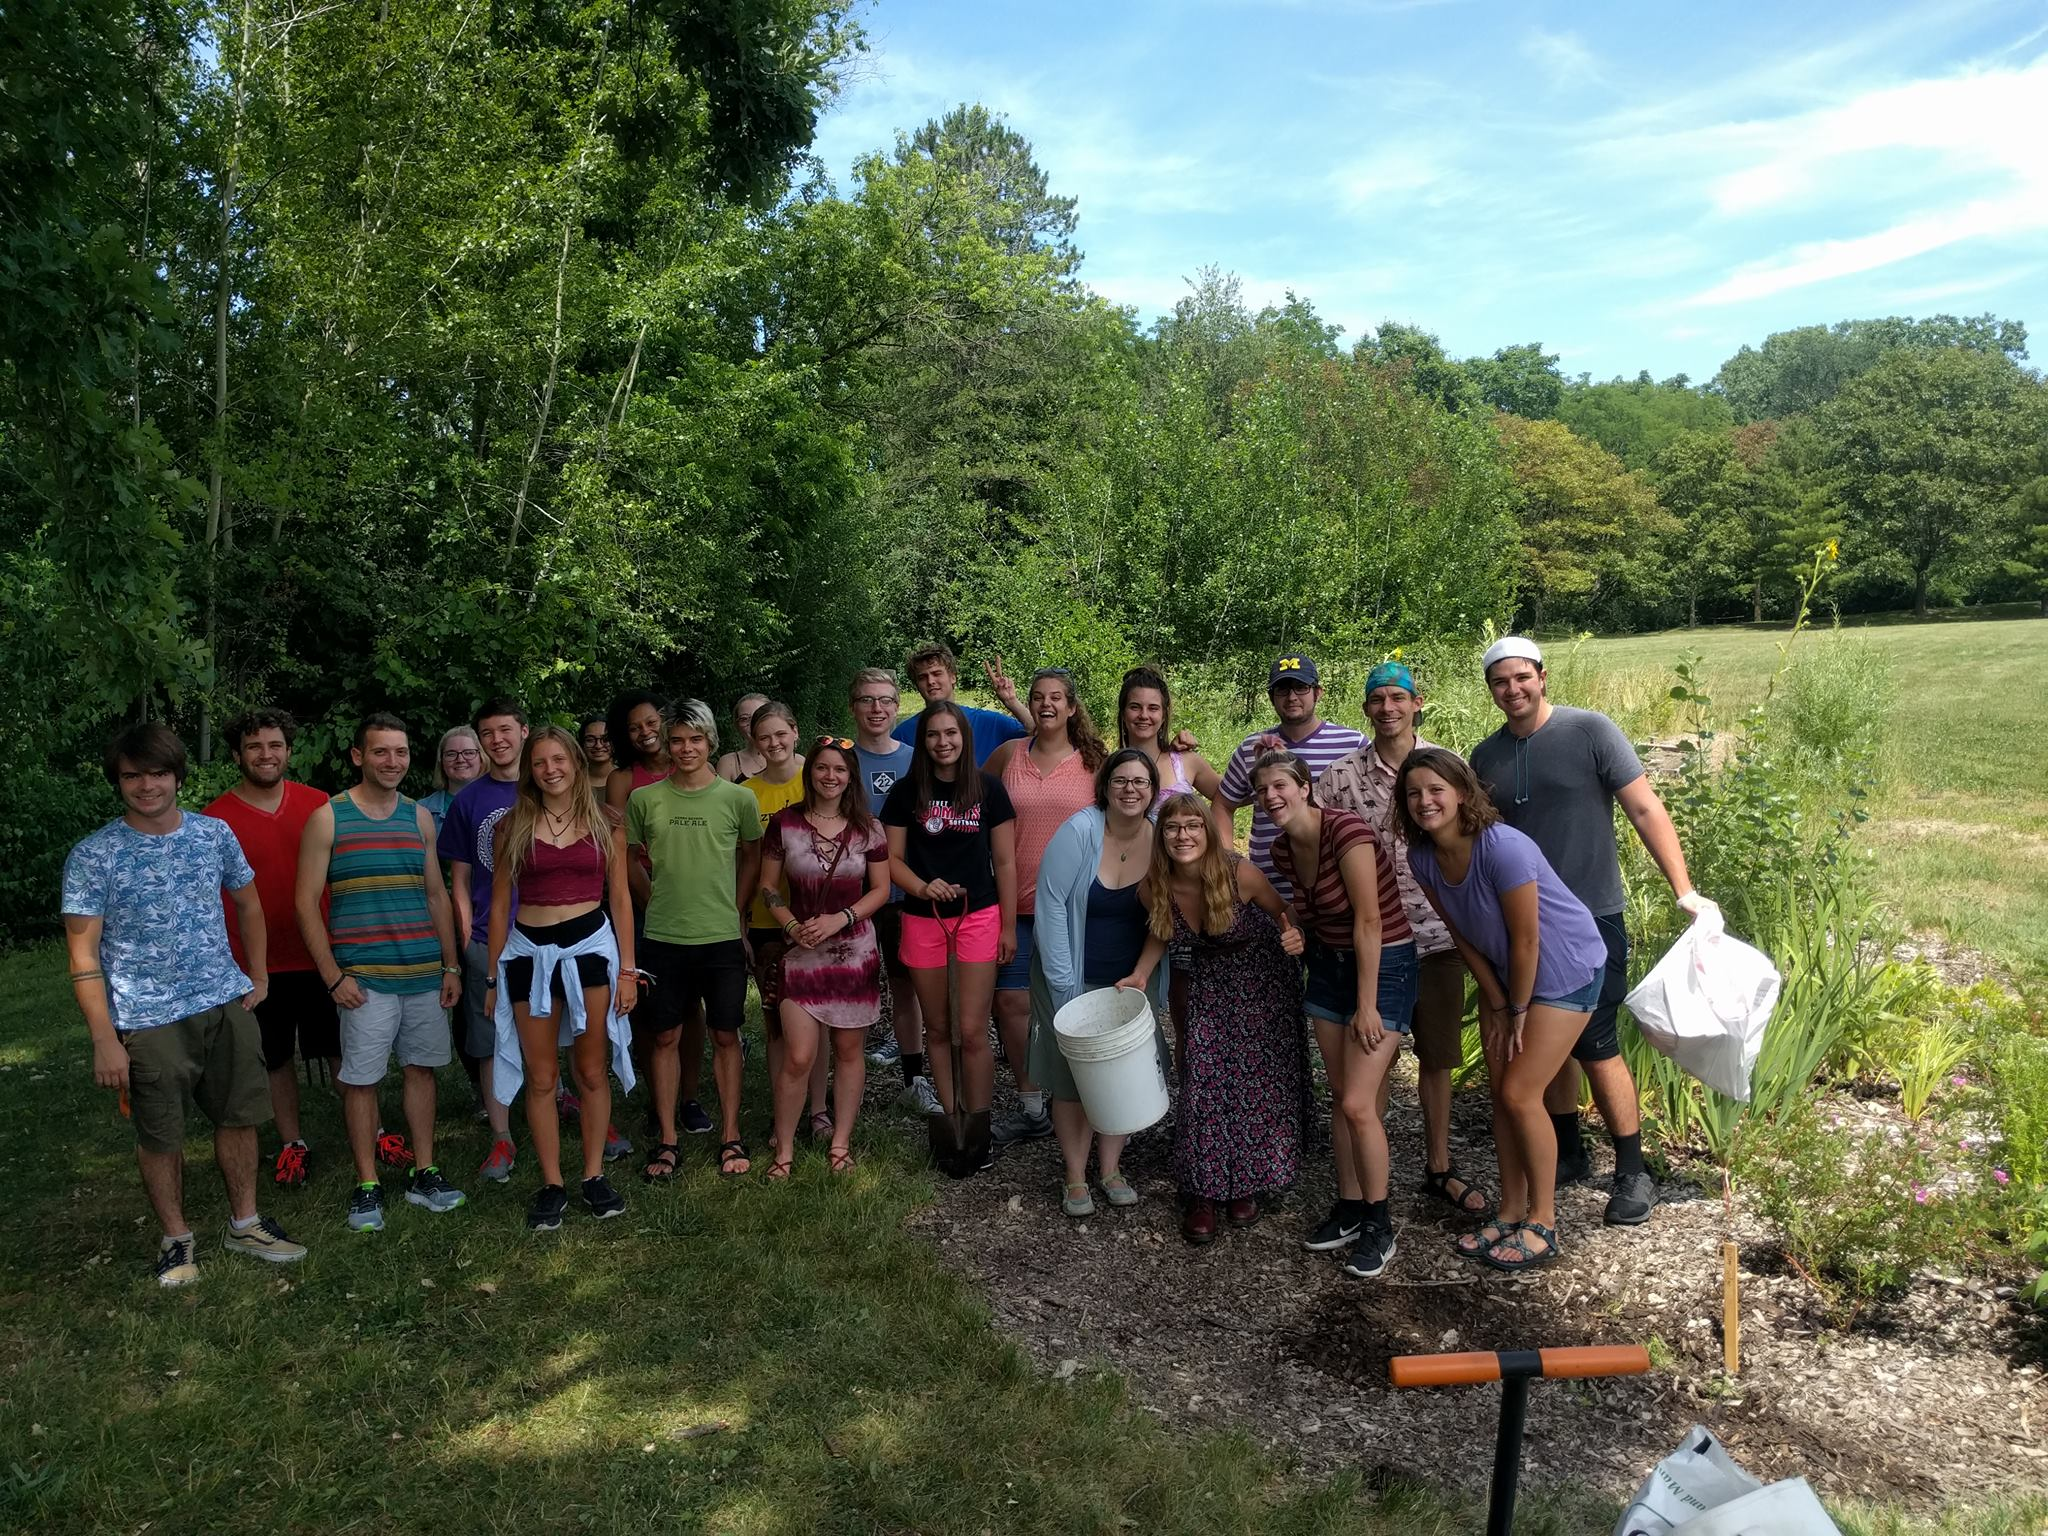 Ann Arbor office at our Adopt A Park Rain Garden Site